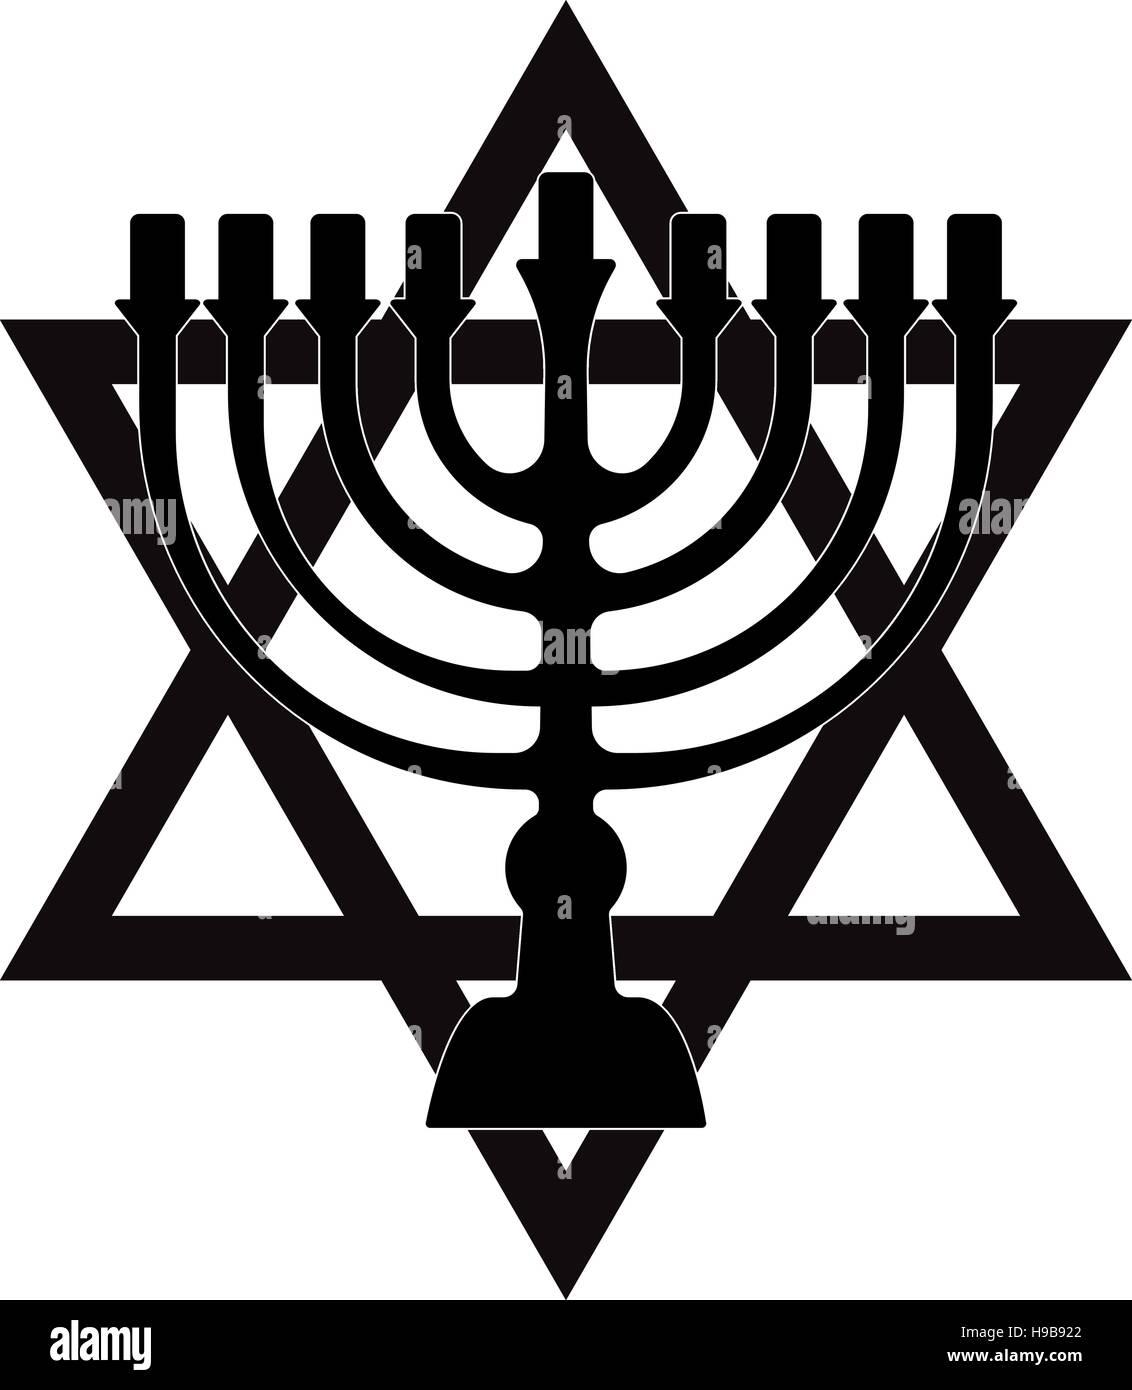 Menorah for Hanukkah, Vector illustration. Religion icon. Silhouette Flat style - Stock Vector